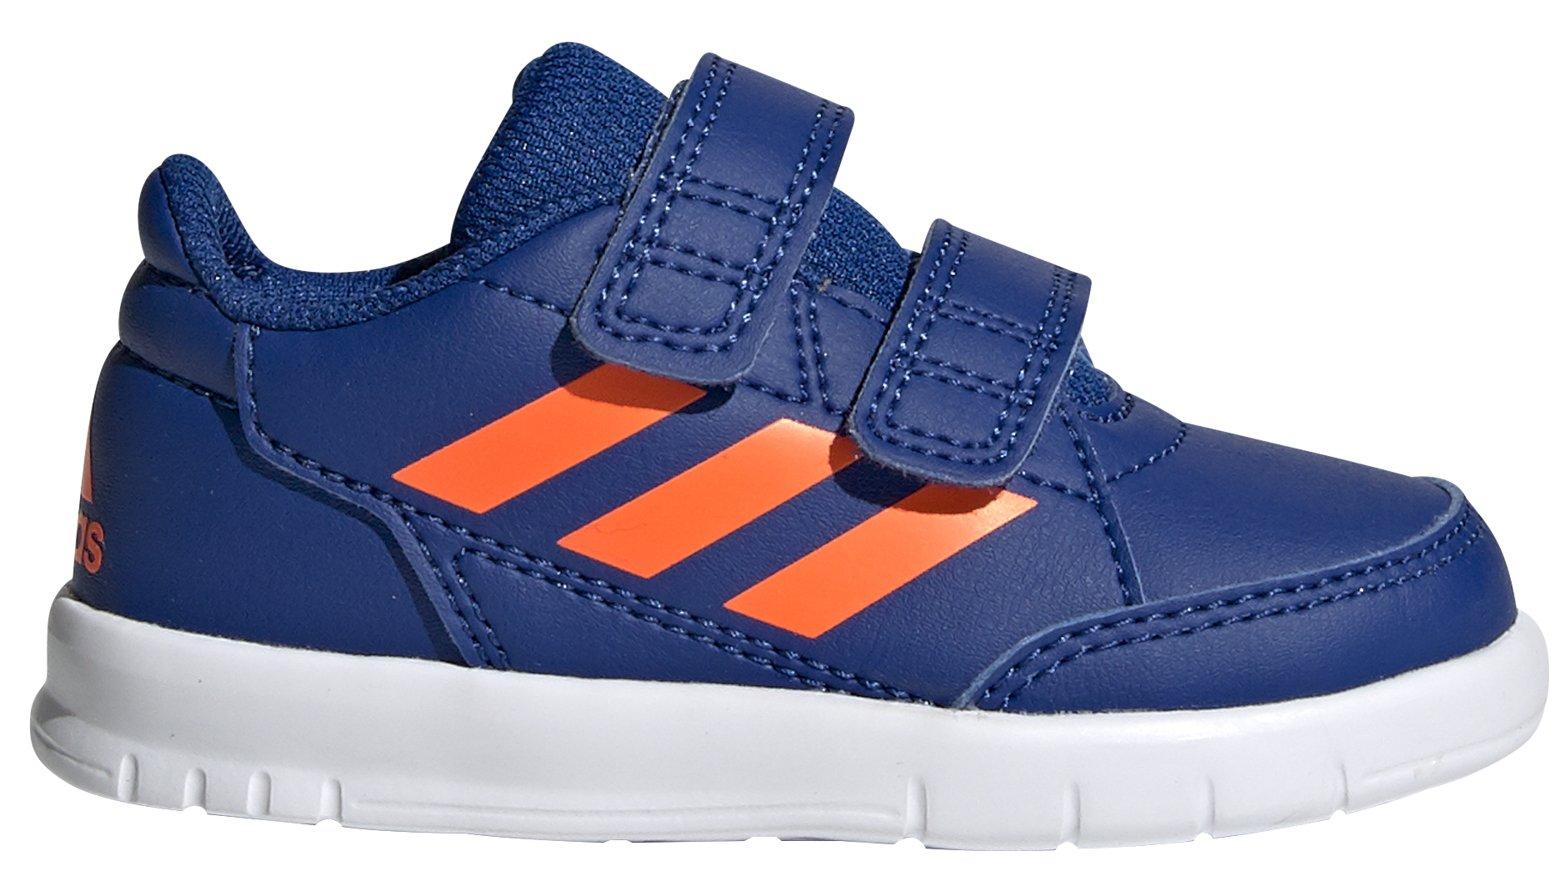 Adidas AltaSport CF I 20 EUR